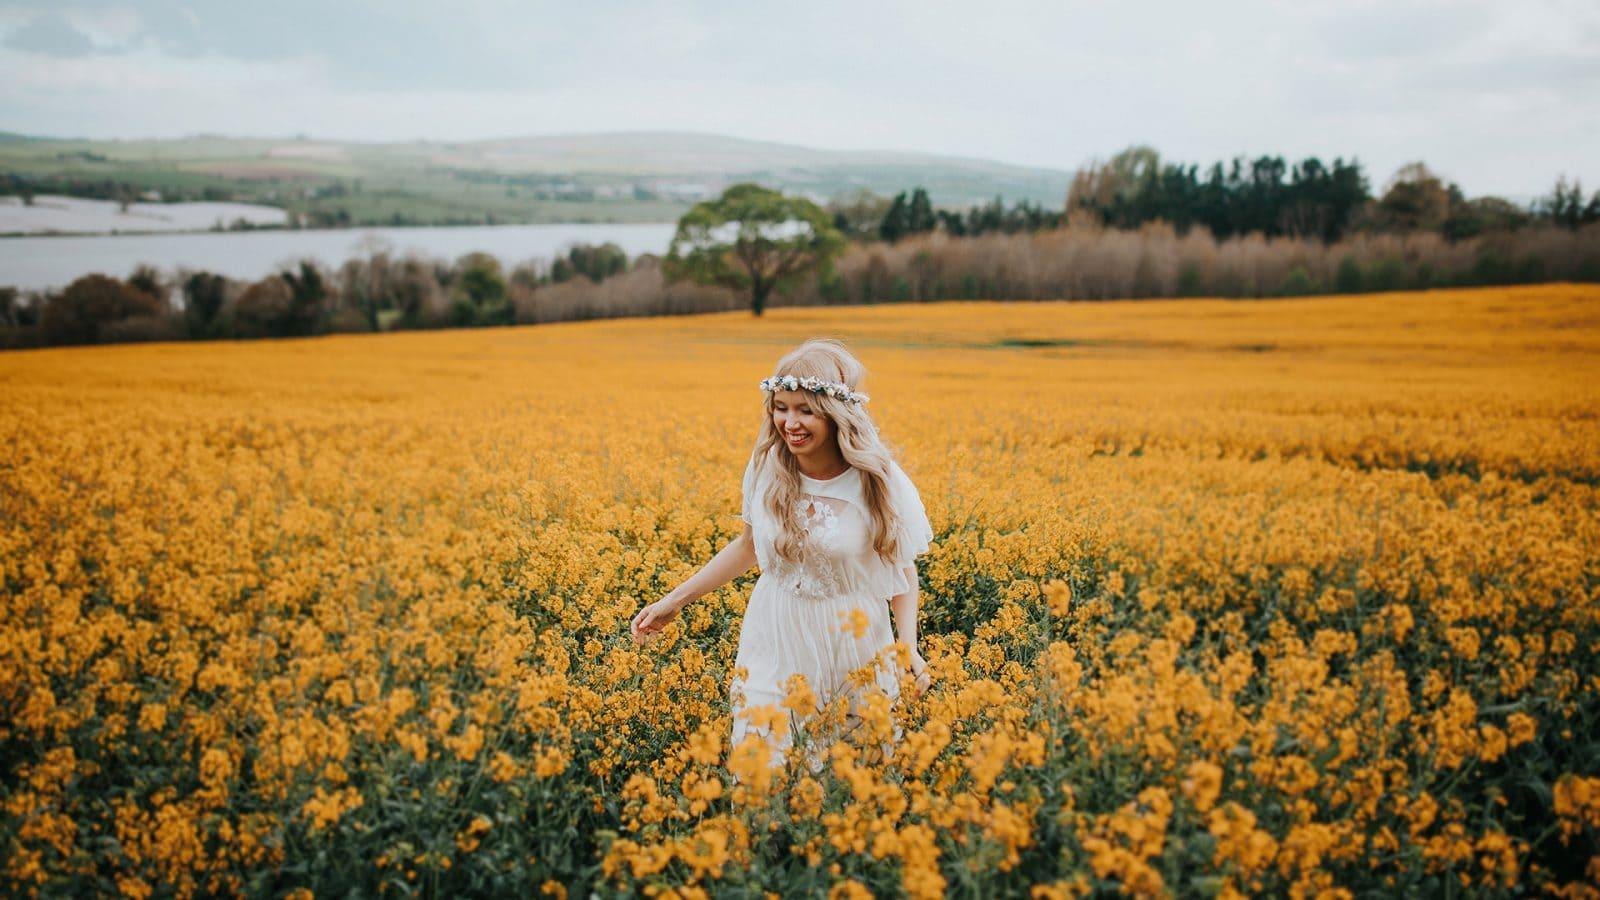 bride running through a rapeseed field in a vintage wedding dress